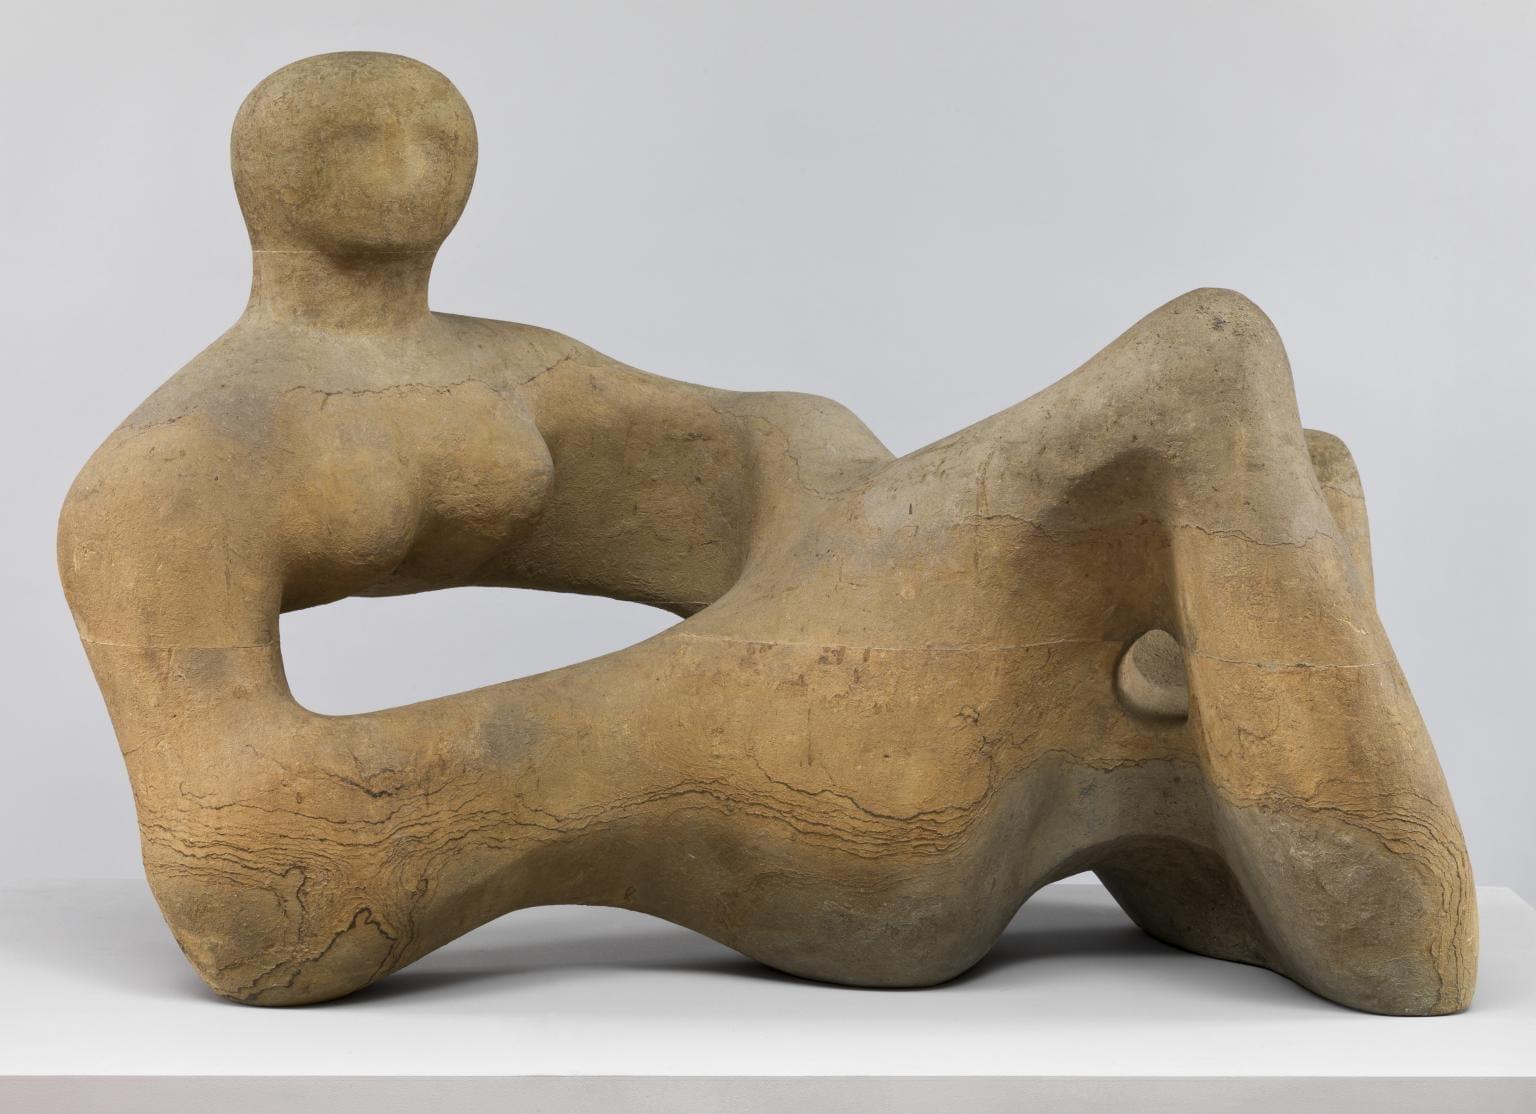 Recumbent figure 1938 henry moore